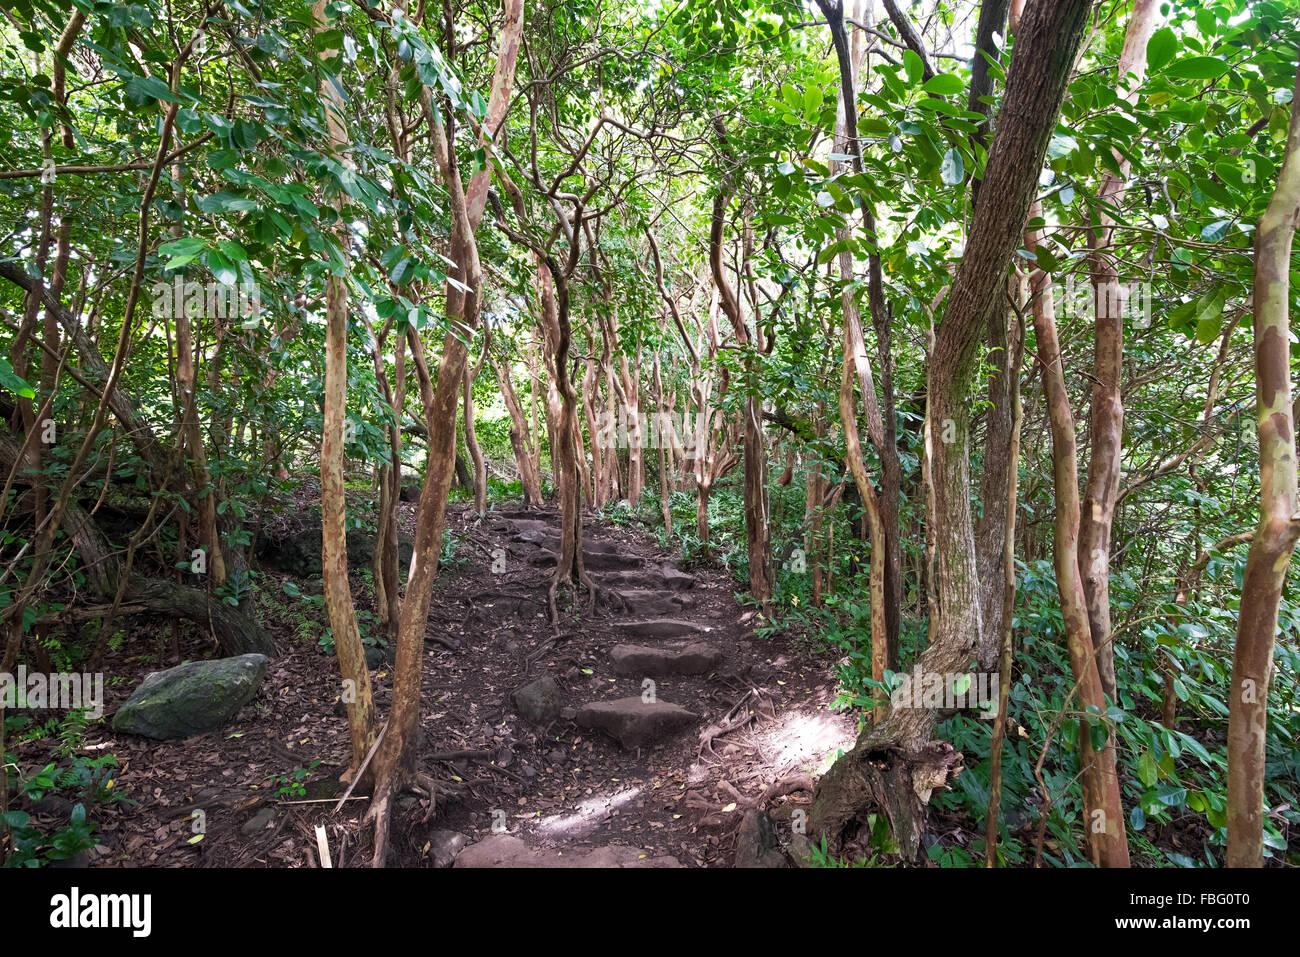 The Pipiwai Trail travels through a eucalyptus grove - Stock Image